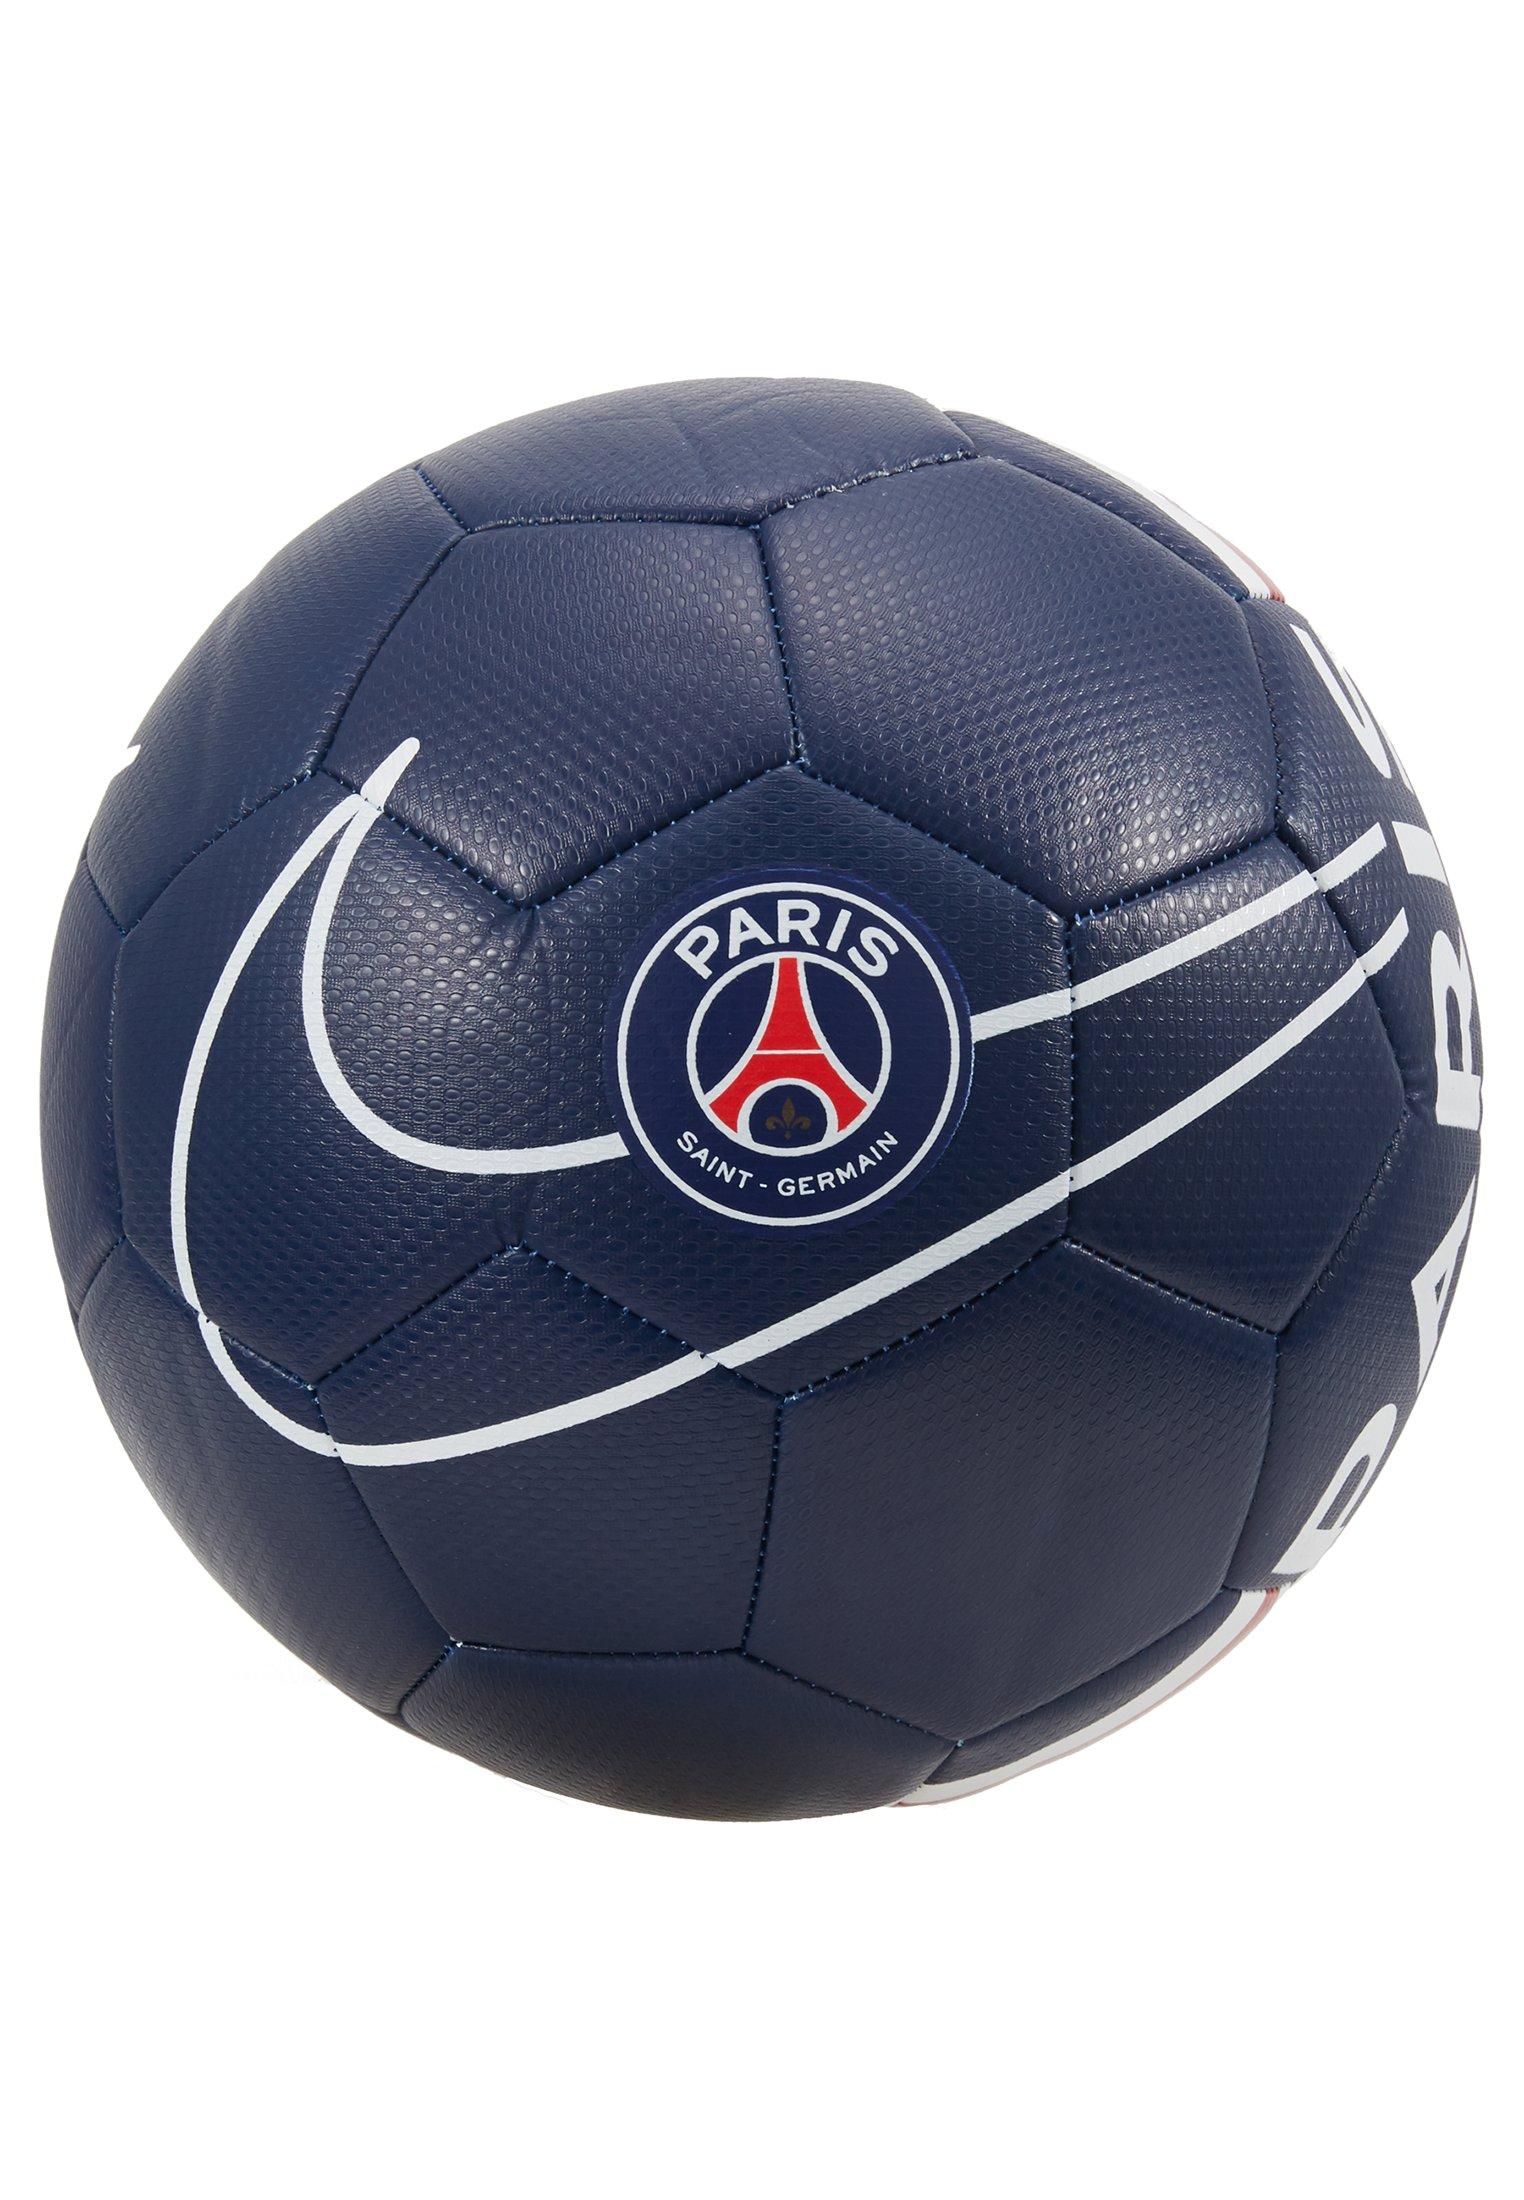 Performance Red De Paris St Navy GermainEquipement university white Nike Midnight Football 8nPXwOk0